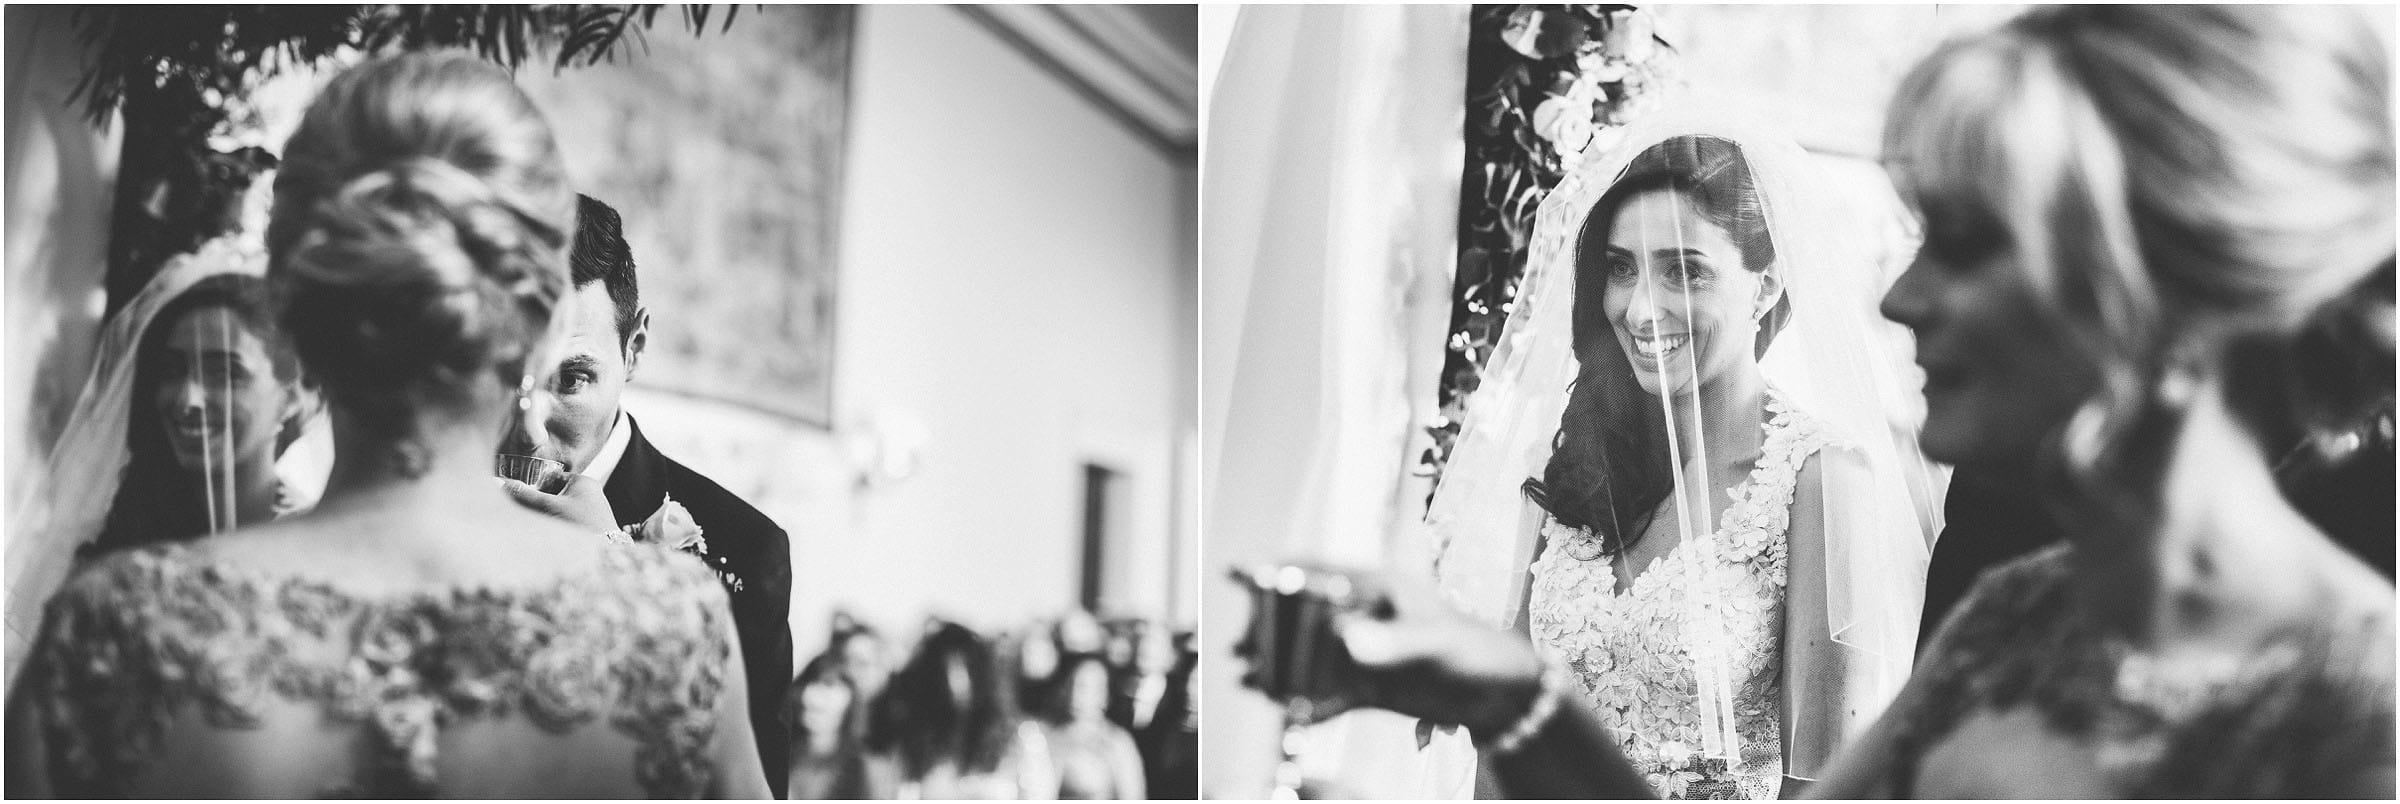 Elmore_Court_Wedding_Photography_0047